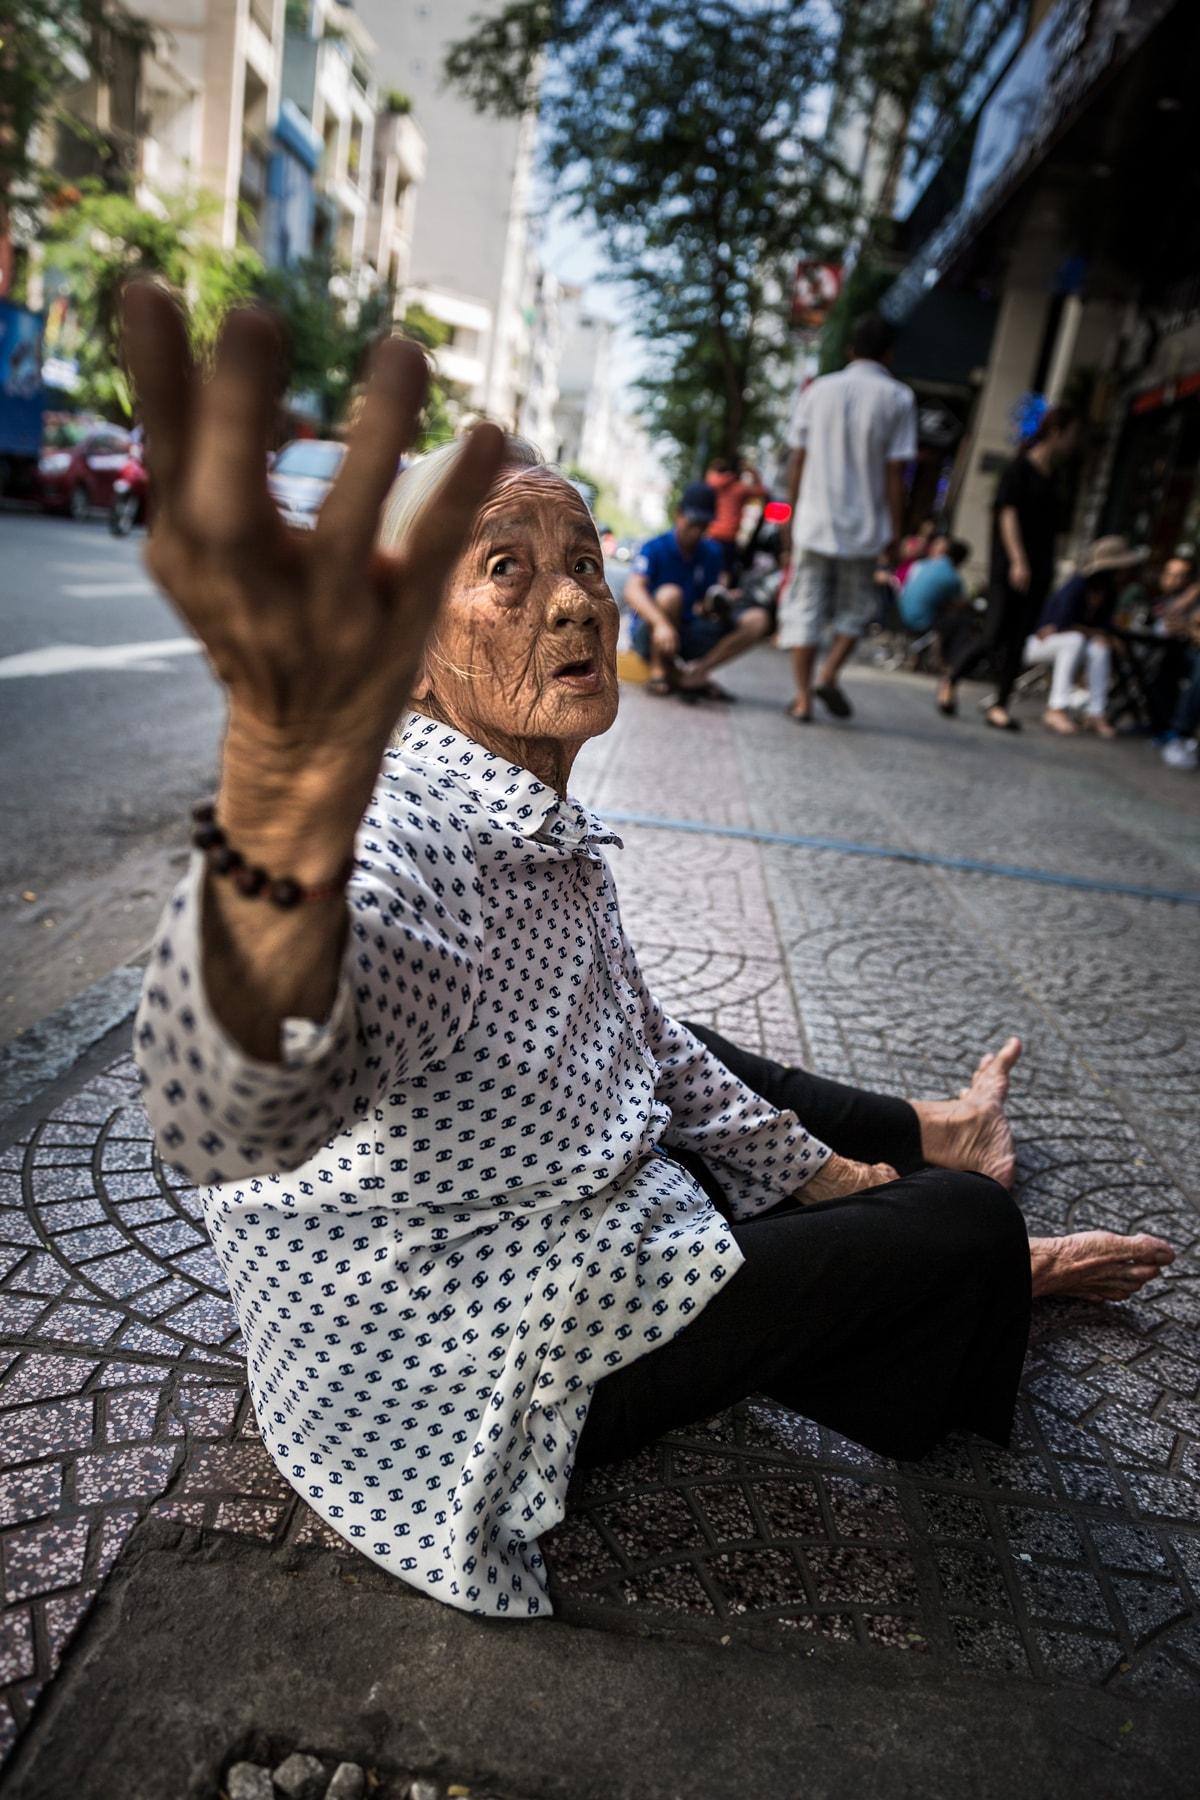 street-documentary-photography-fabio-burrelli-38.jpg